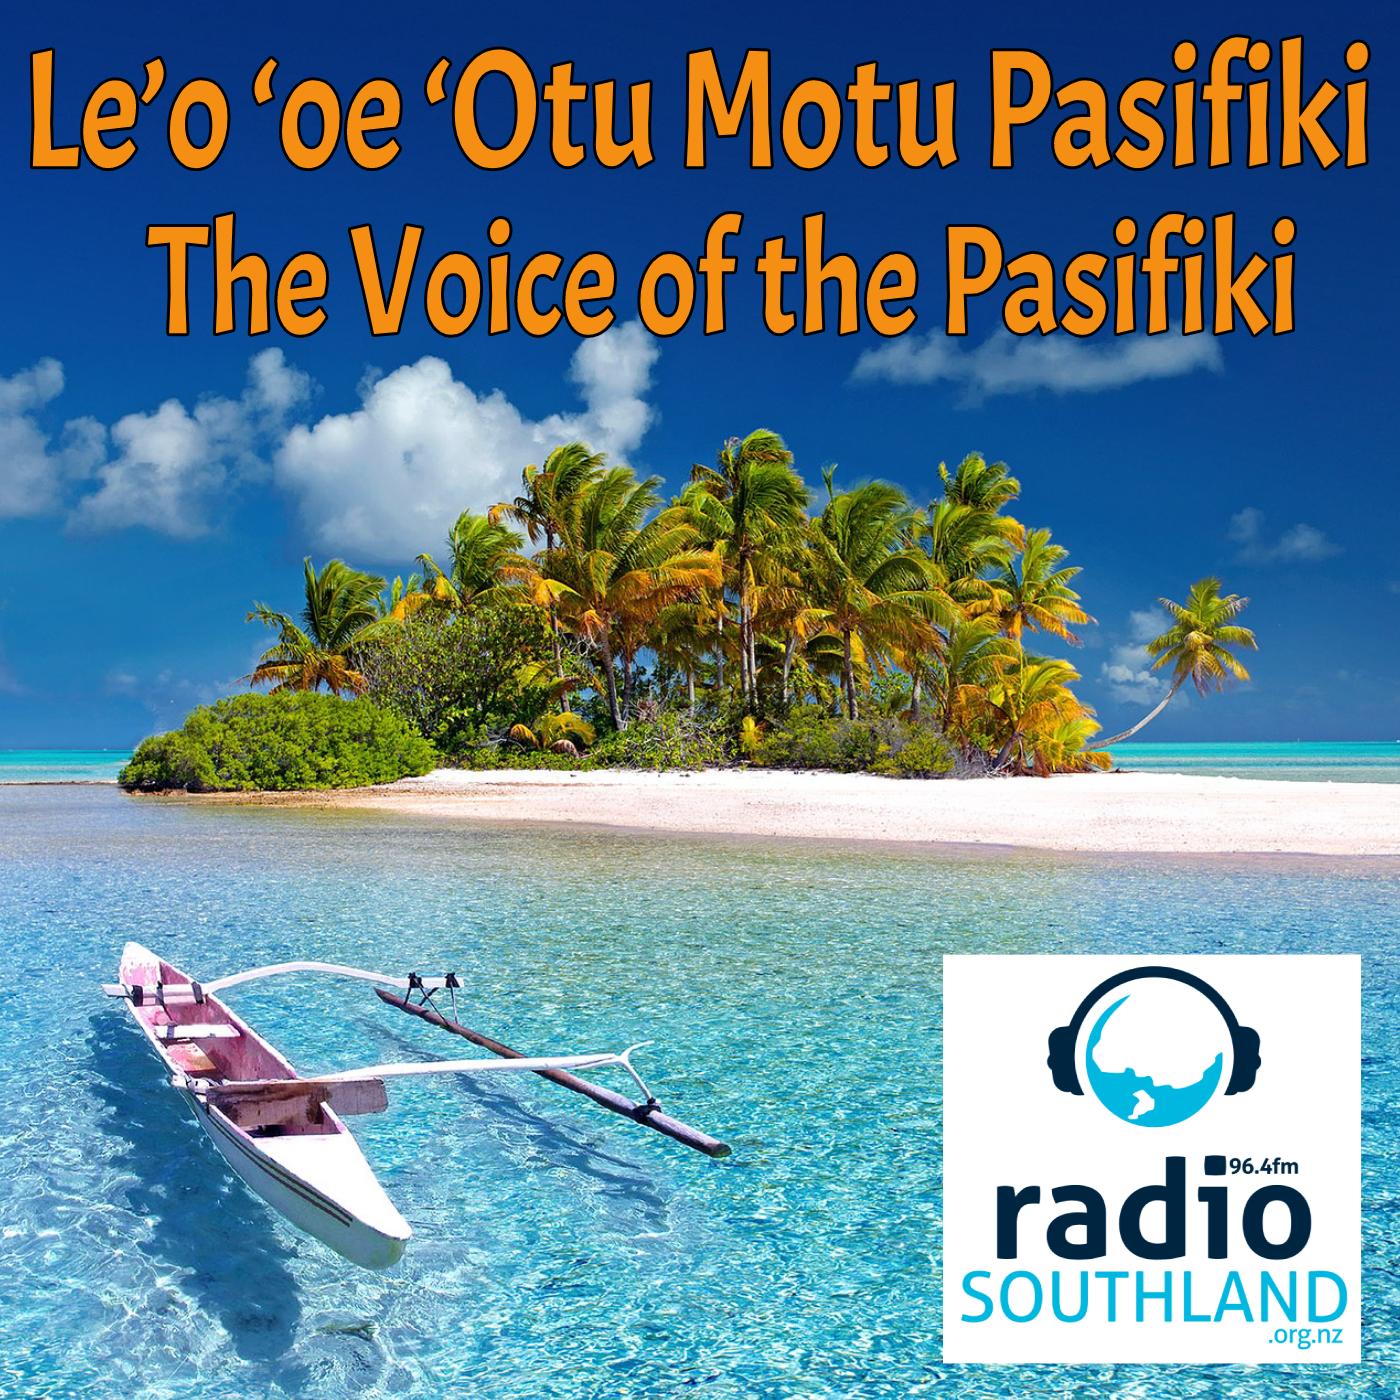 Le'o 'oe 'Otu Motu Pasifiki/The Voice of the Pasifiki